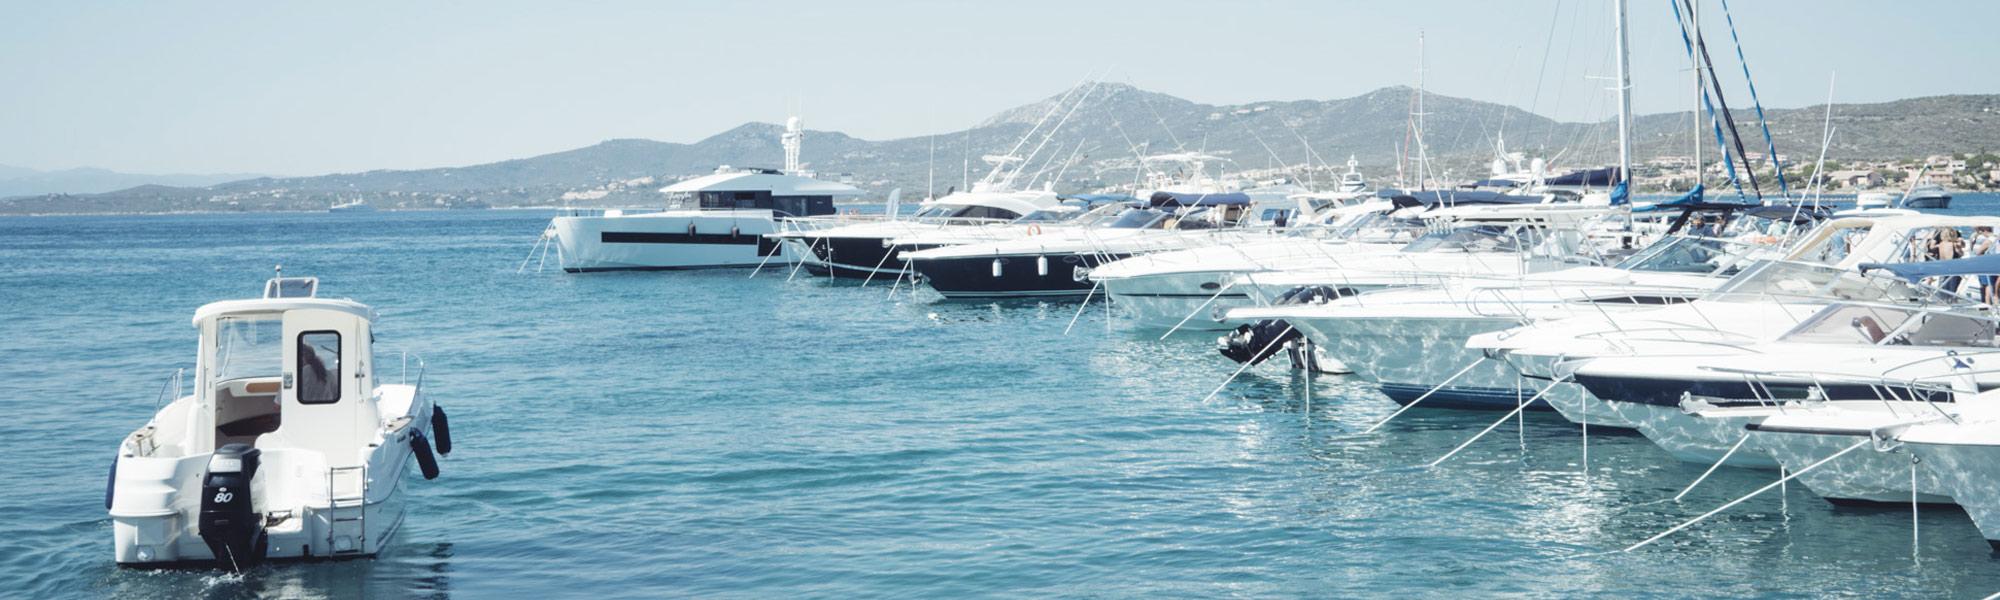 Marina di Golfo Aranci Posti Barca